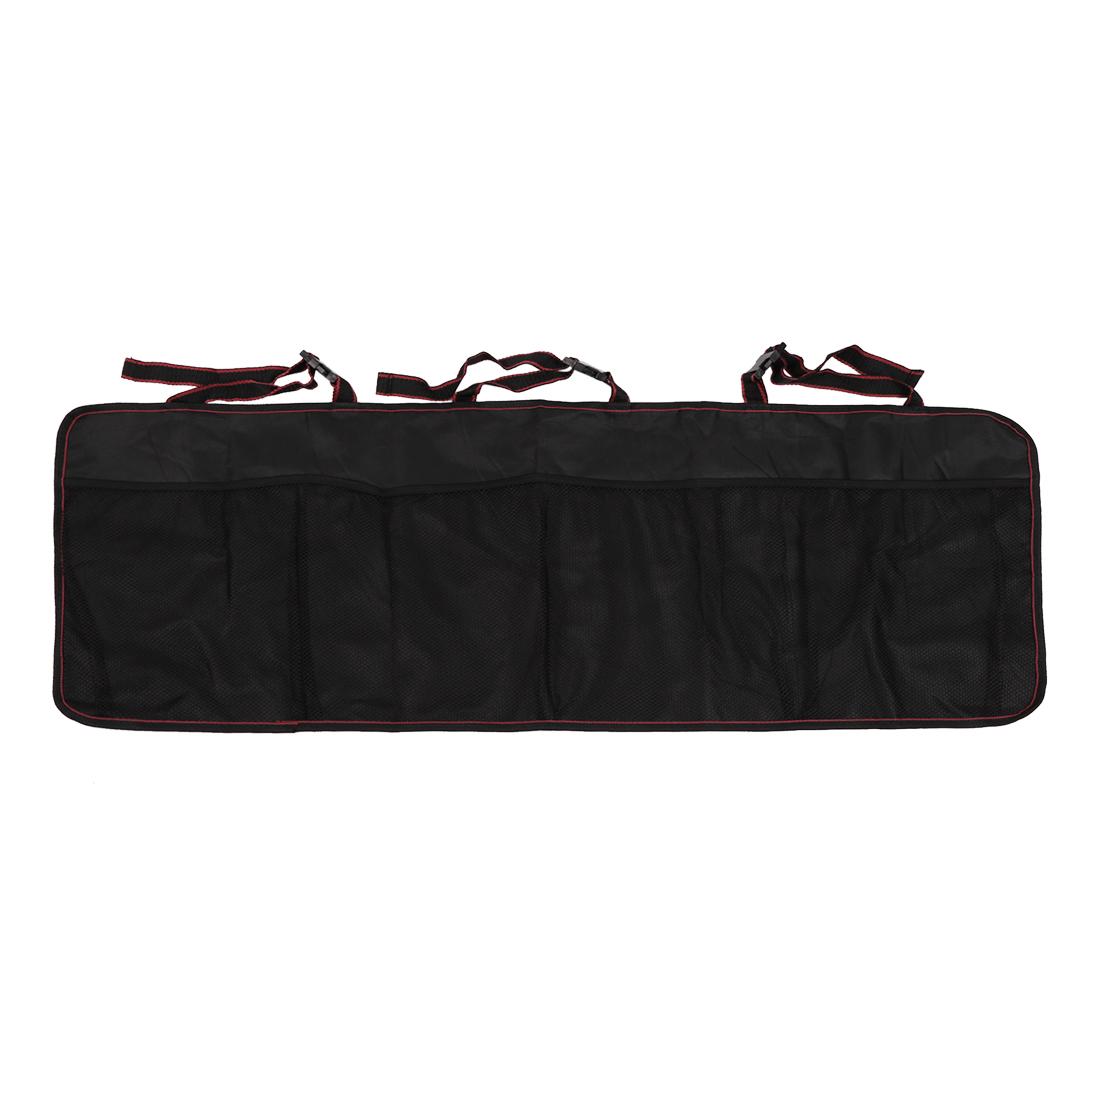 103x36cm Car Trunk Backseat Organizer Foldable Storage Bag Multi-Pocket